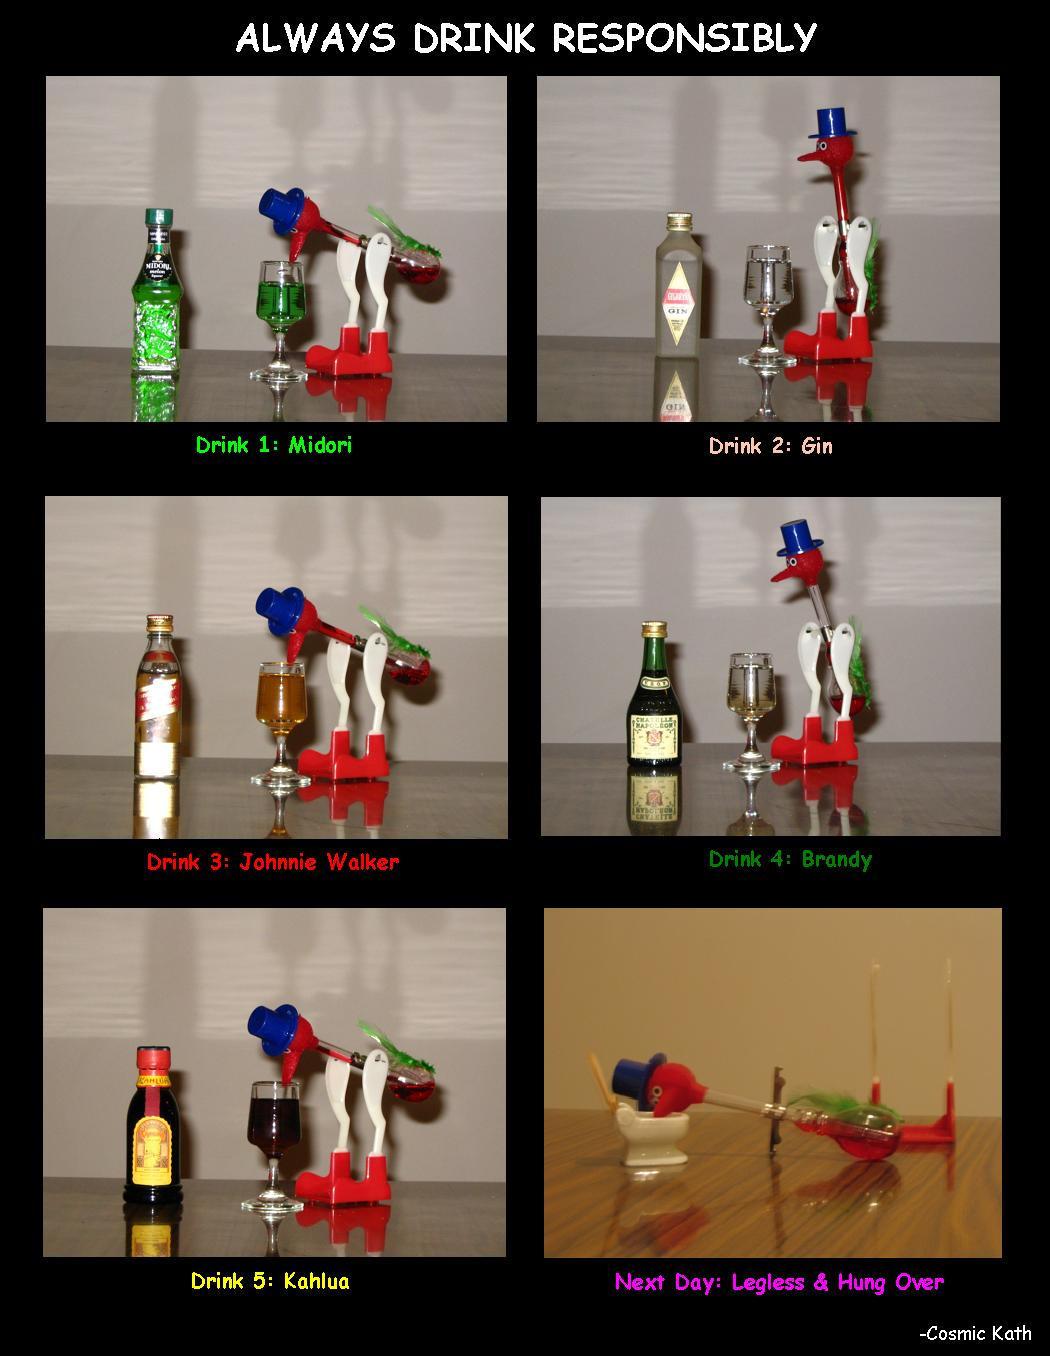 drink responsibly wallpaper - photo #15